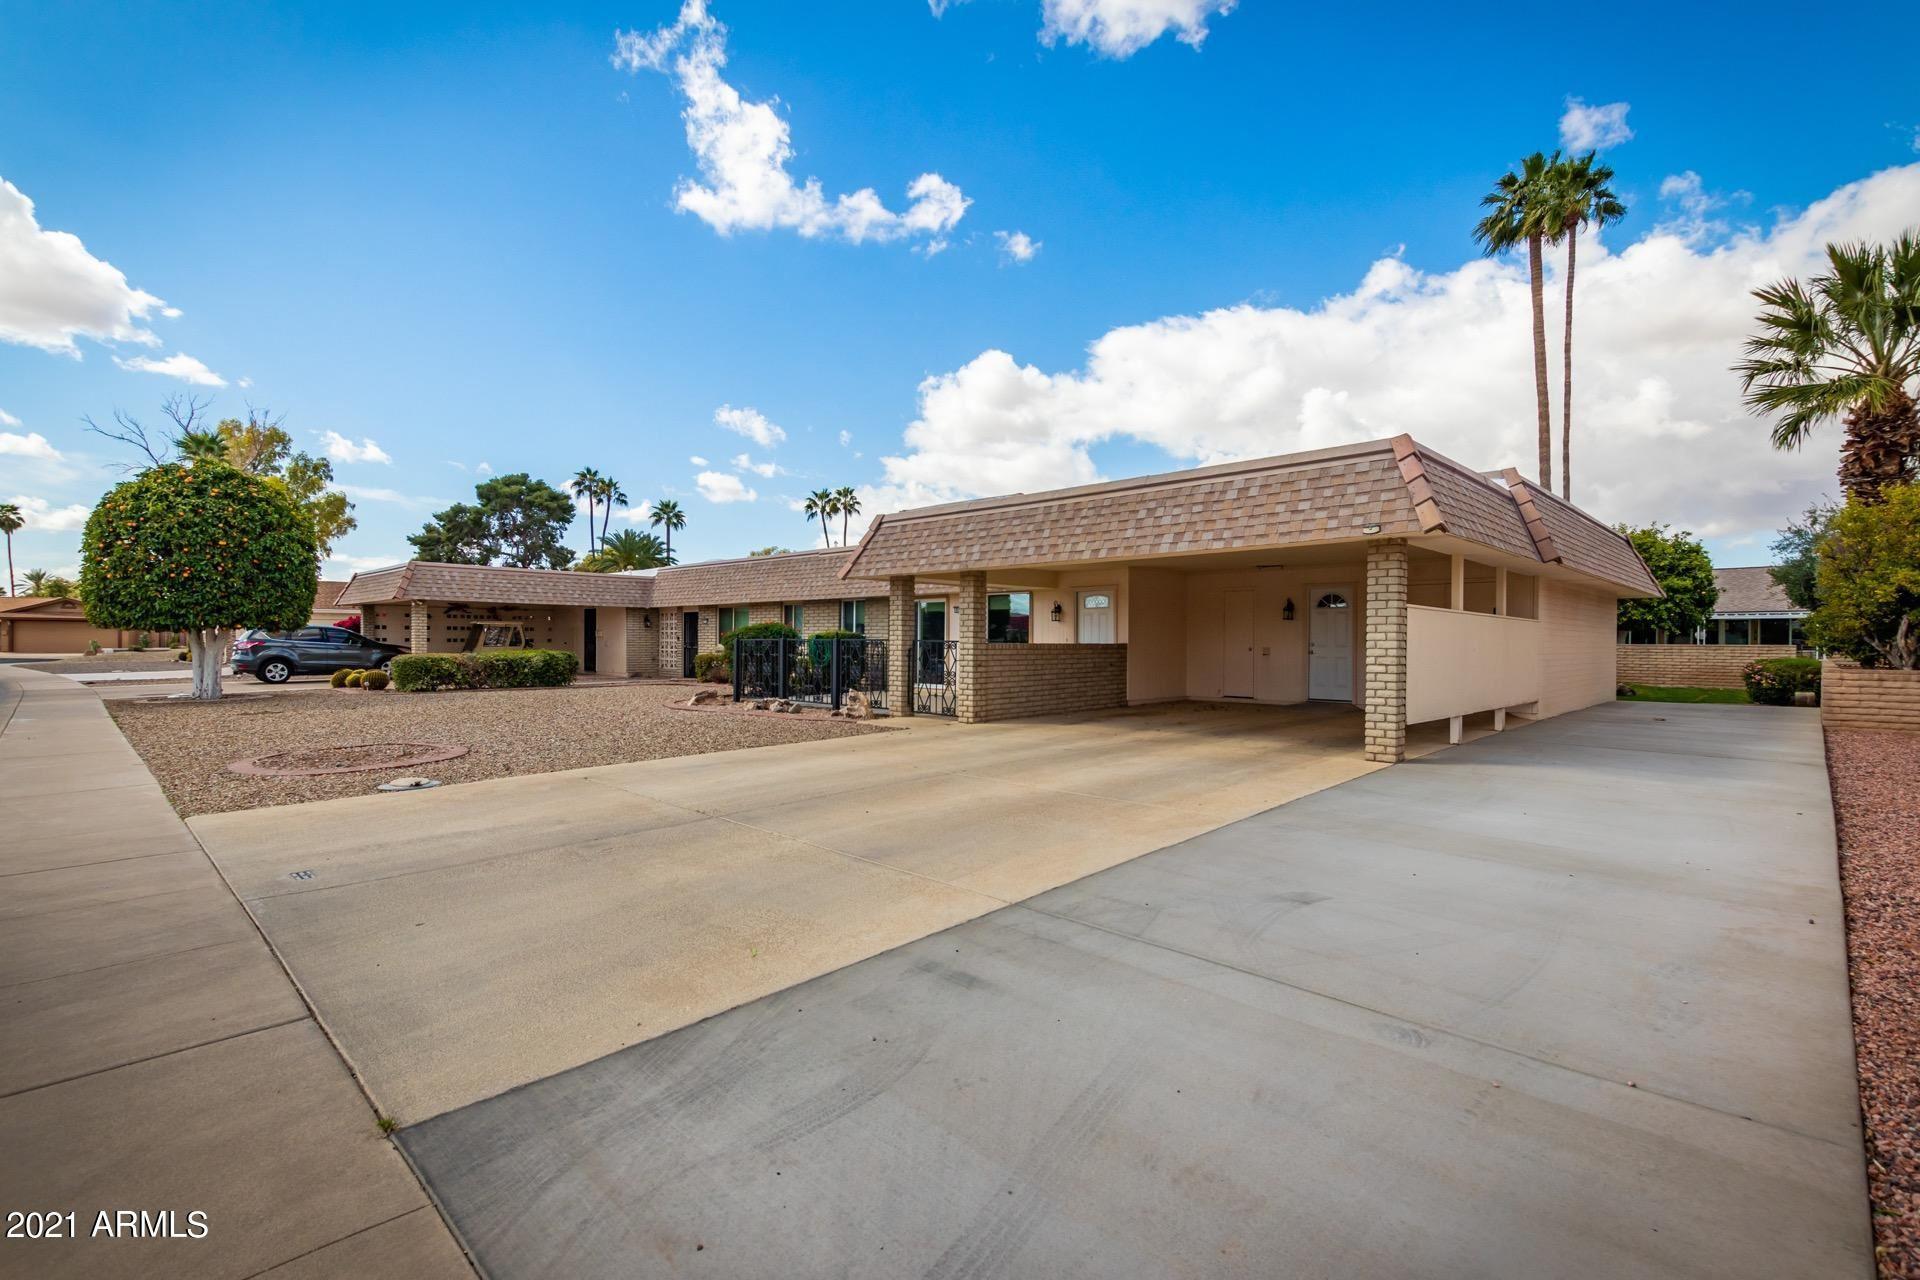 Photo of 9736 N 105TH Avenue, Sun City, AZ 85351 (MLS # 6202310)